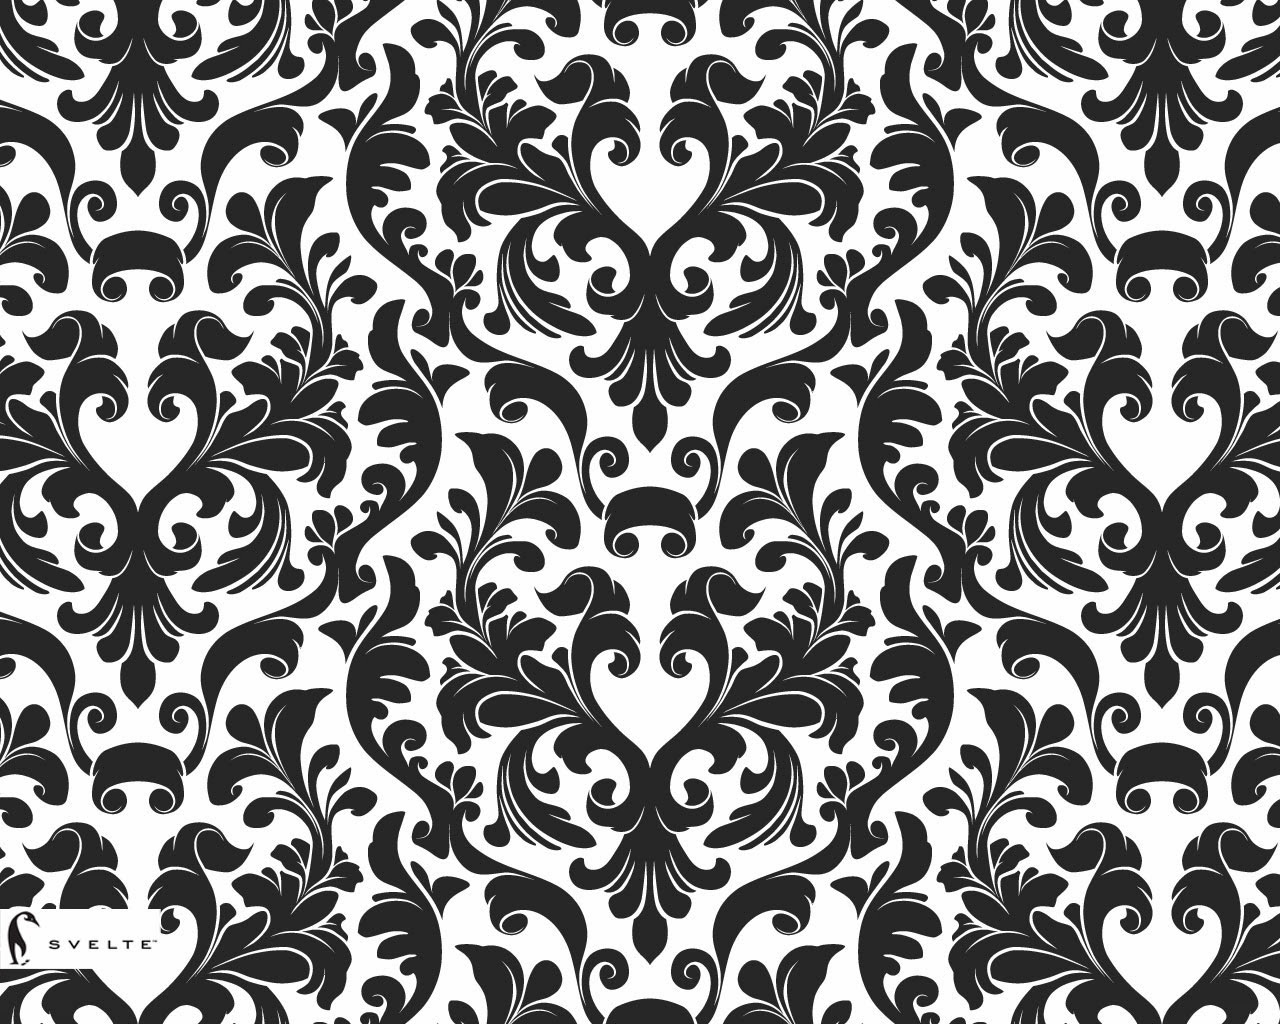 Black And White Damask Patterns Wallpaper 1280x1024